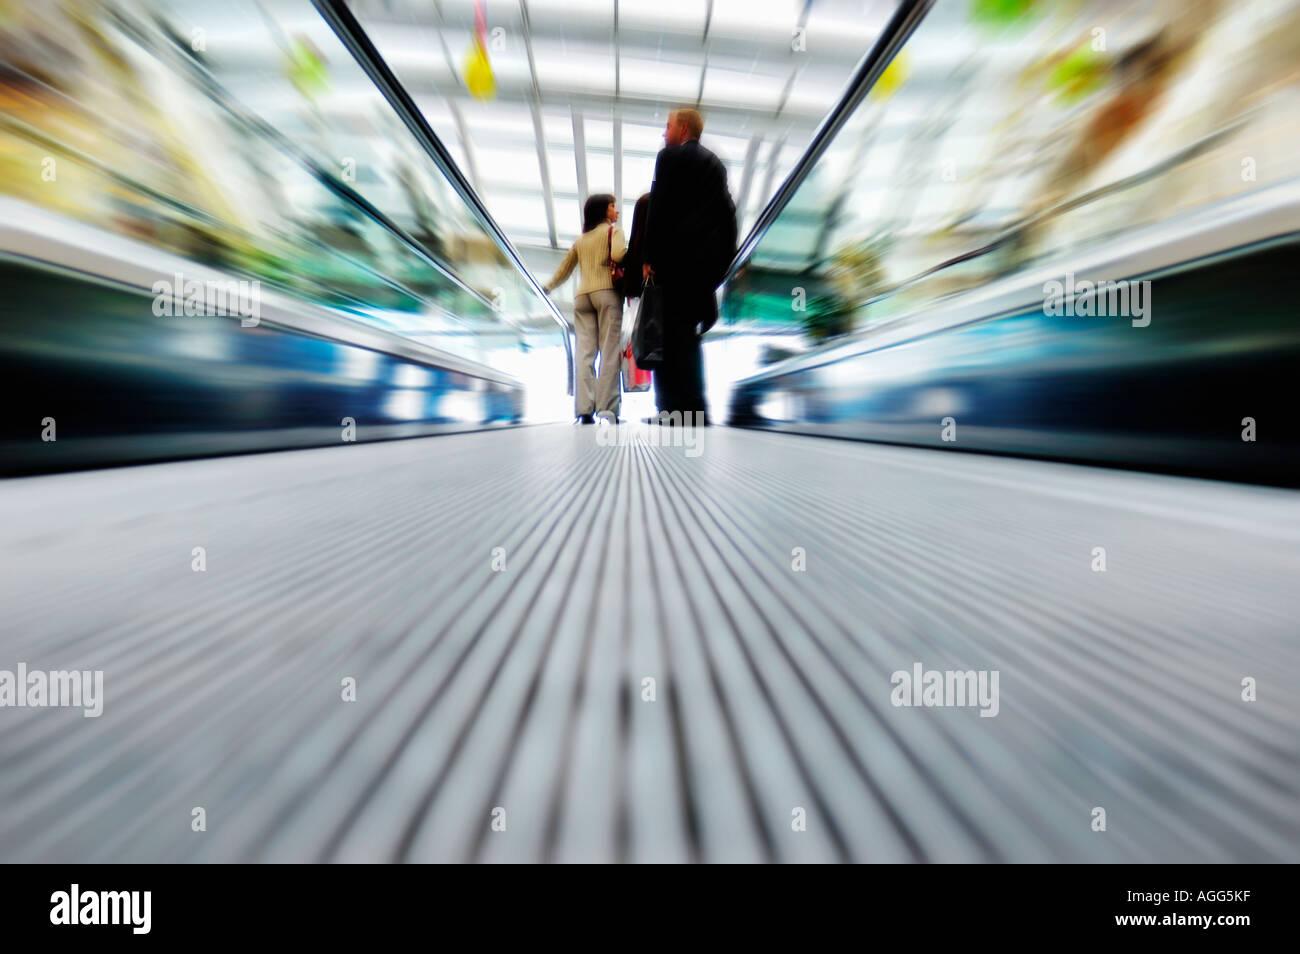 customers on a shopping mall escalator - Stock Image